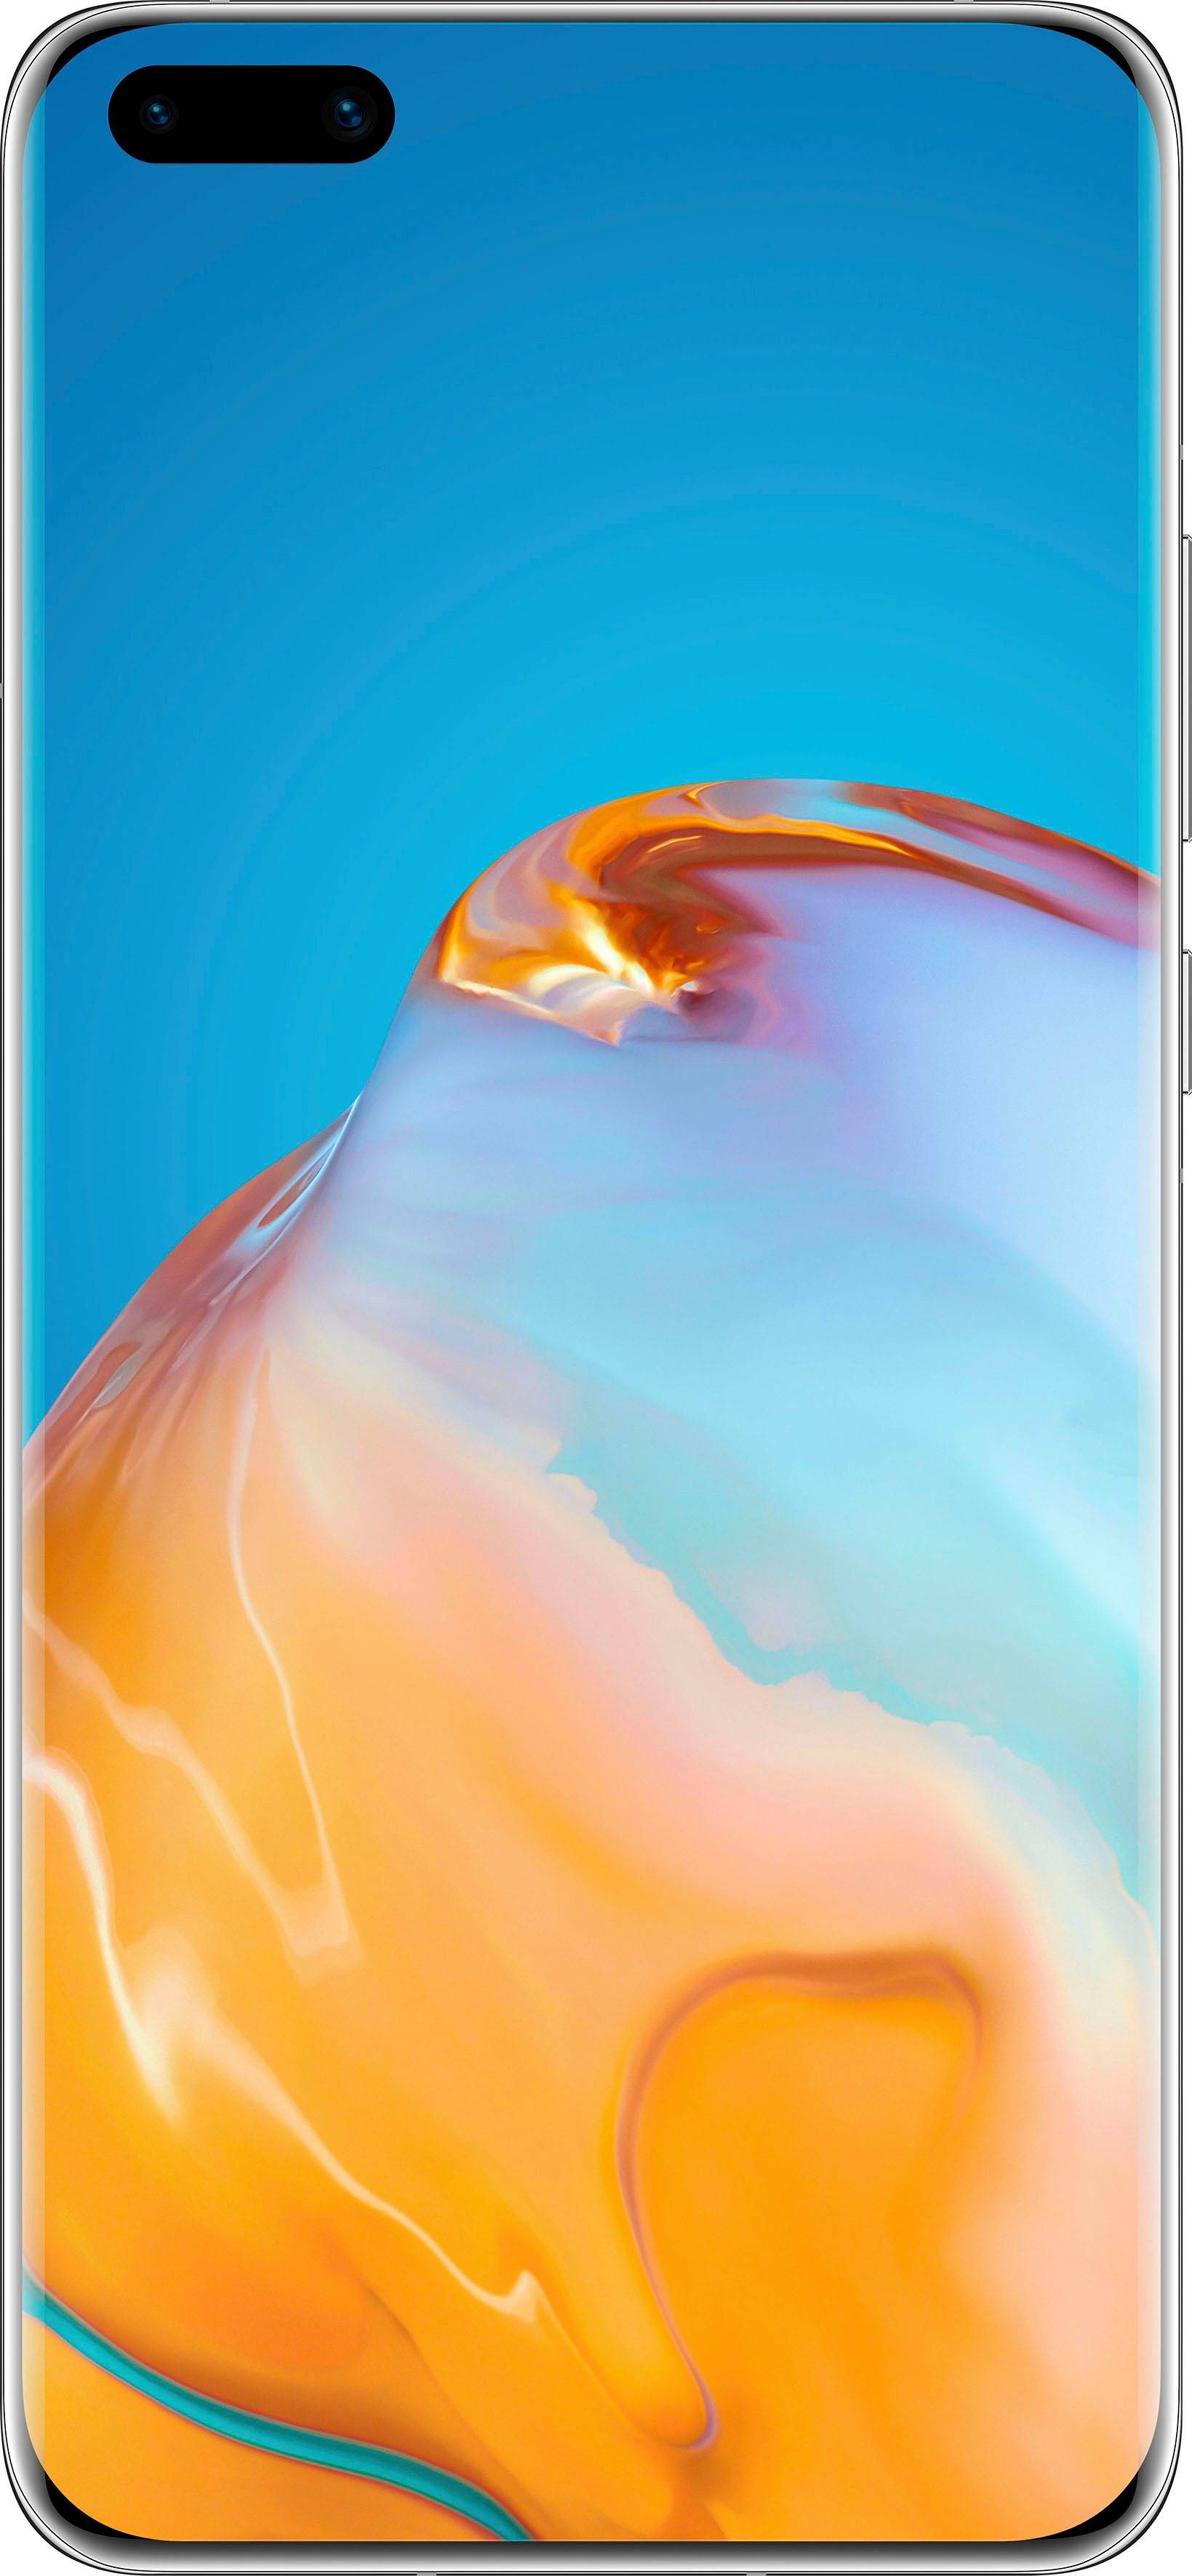 Huawei P40 Pro+ 5G Smartphone (16,7 cm/6,58 Zoll, 512 GB Speicherplatz, 50 MP Kamera), white